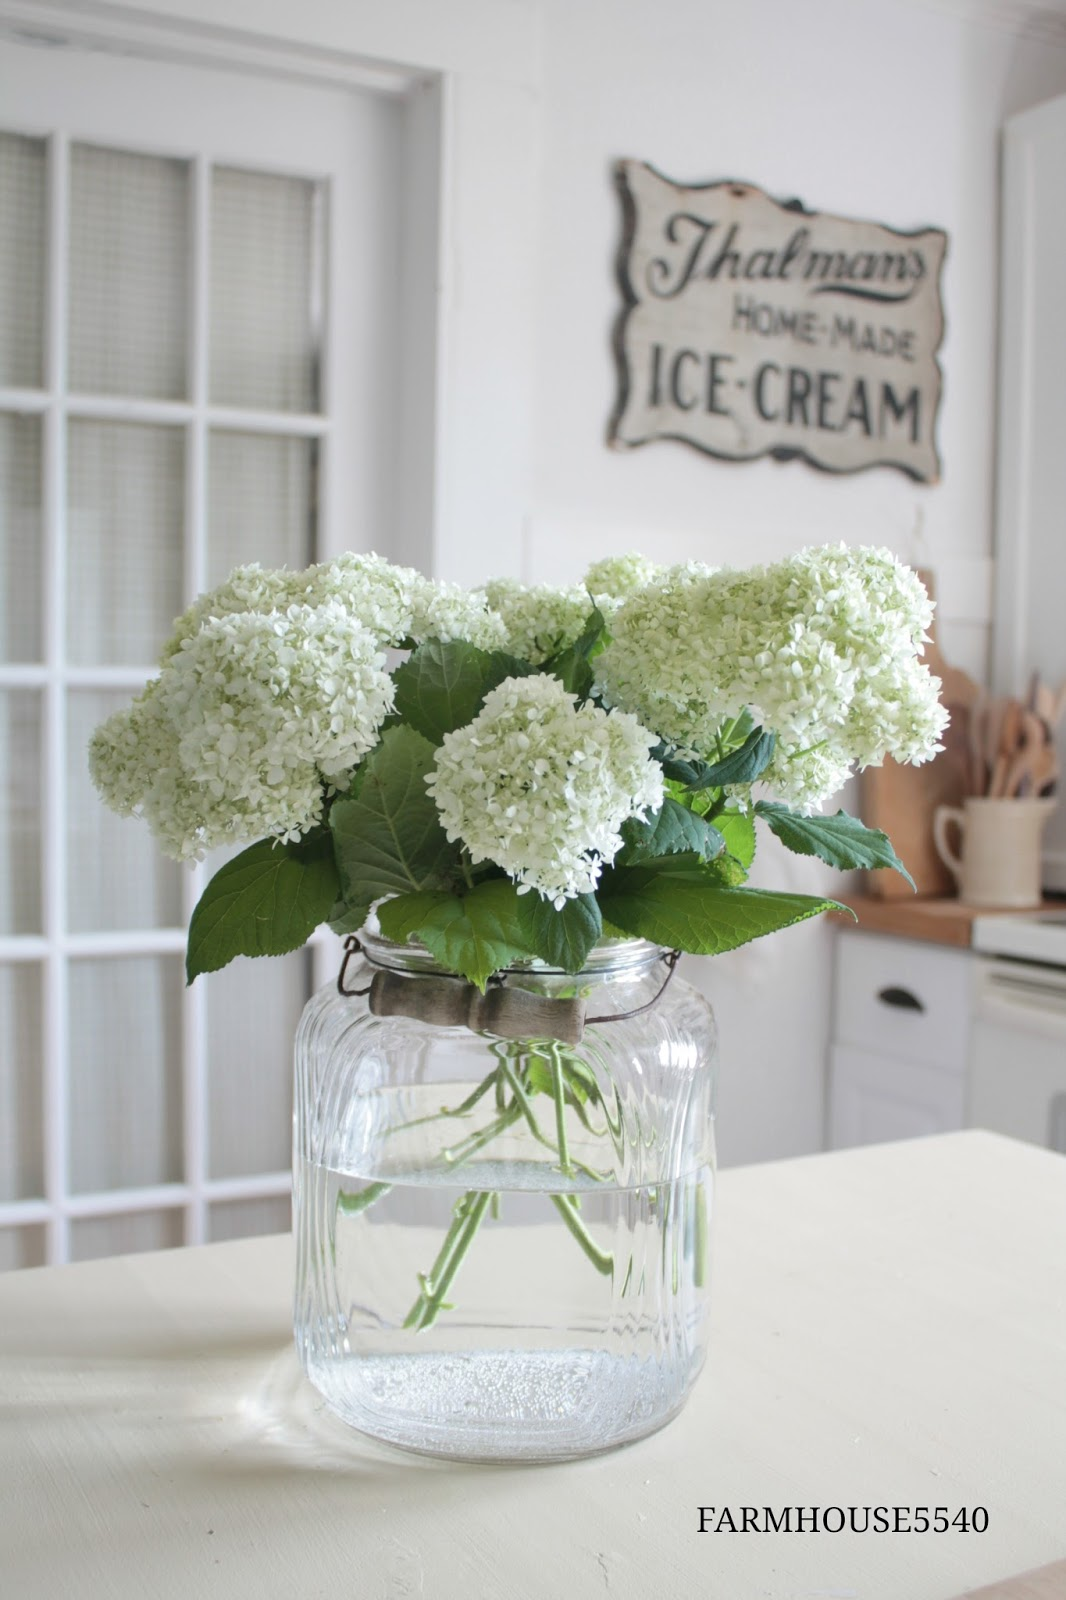 FARMHOUSE 5540 Fresh Cut Flowers